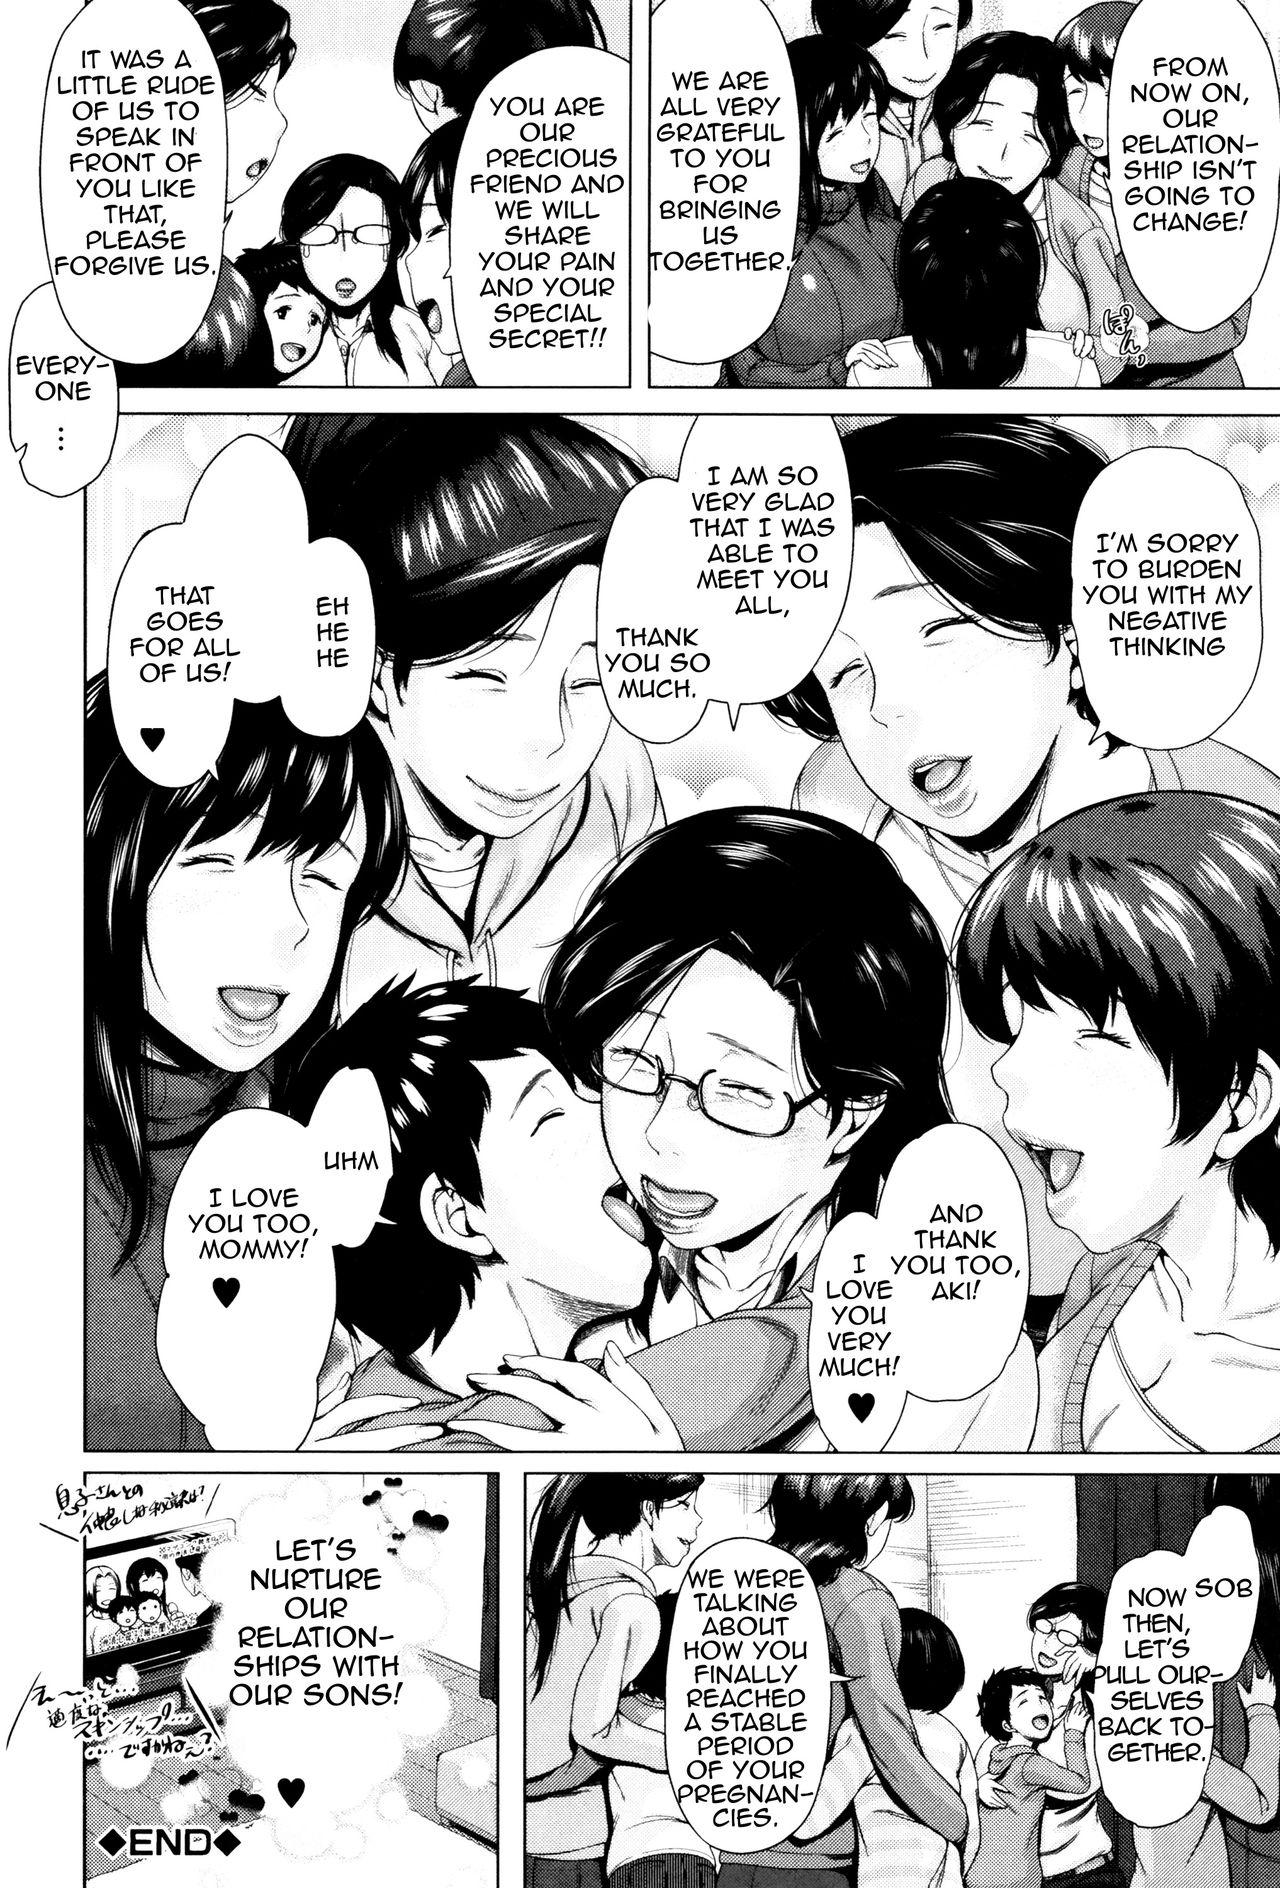 [Jitsuma] Kinyoubi no Haha-tachi e - To Friday's mothers [English] [Amoskandy, desudesu, Kusanyagi] 196